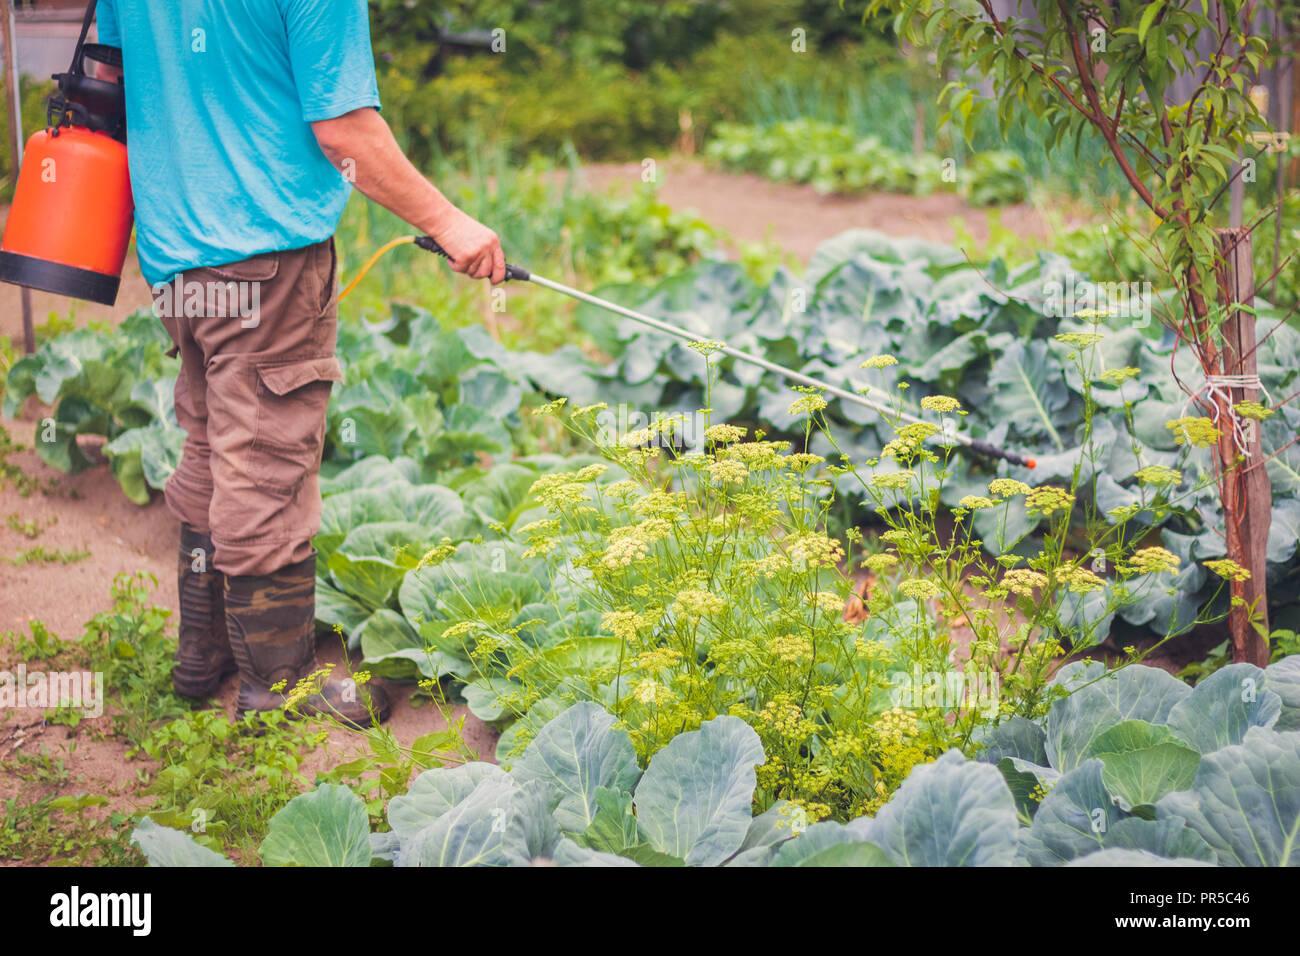 Maladies De Jardin Photos & Maladies De Jardin Images - Alamy